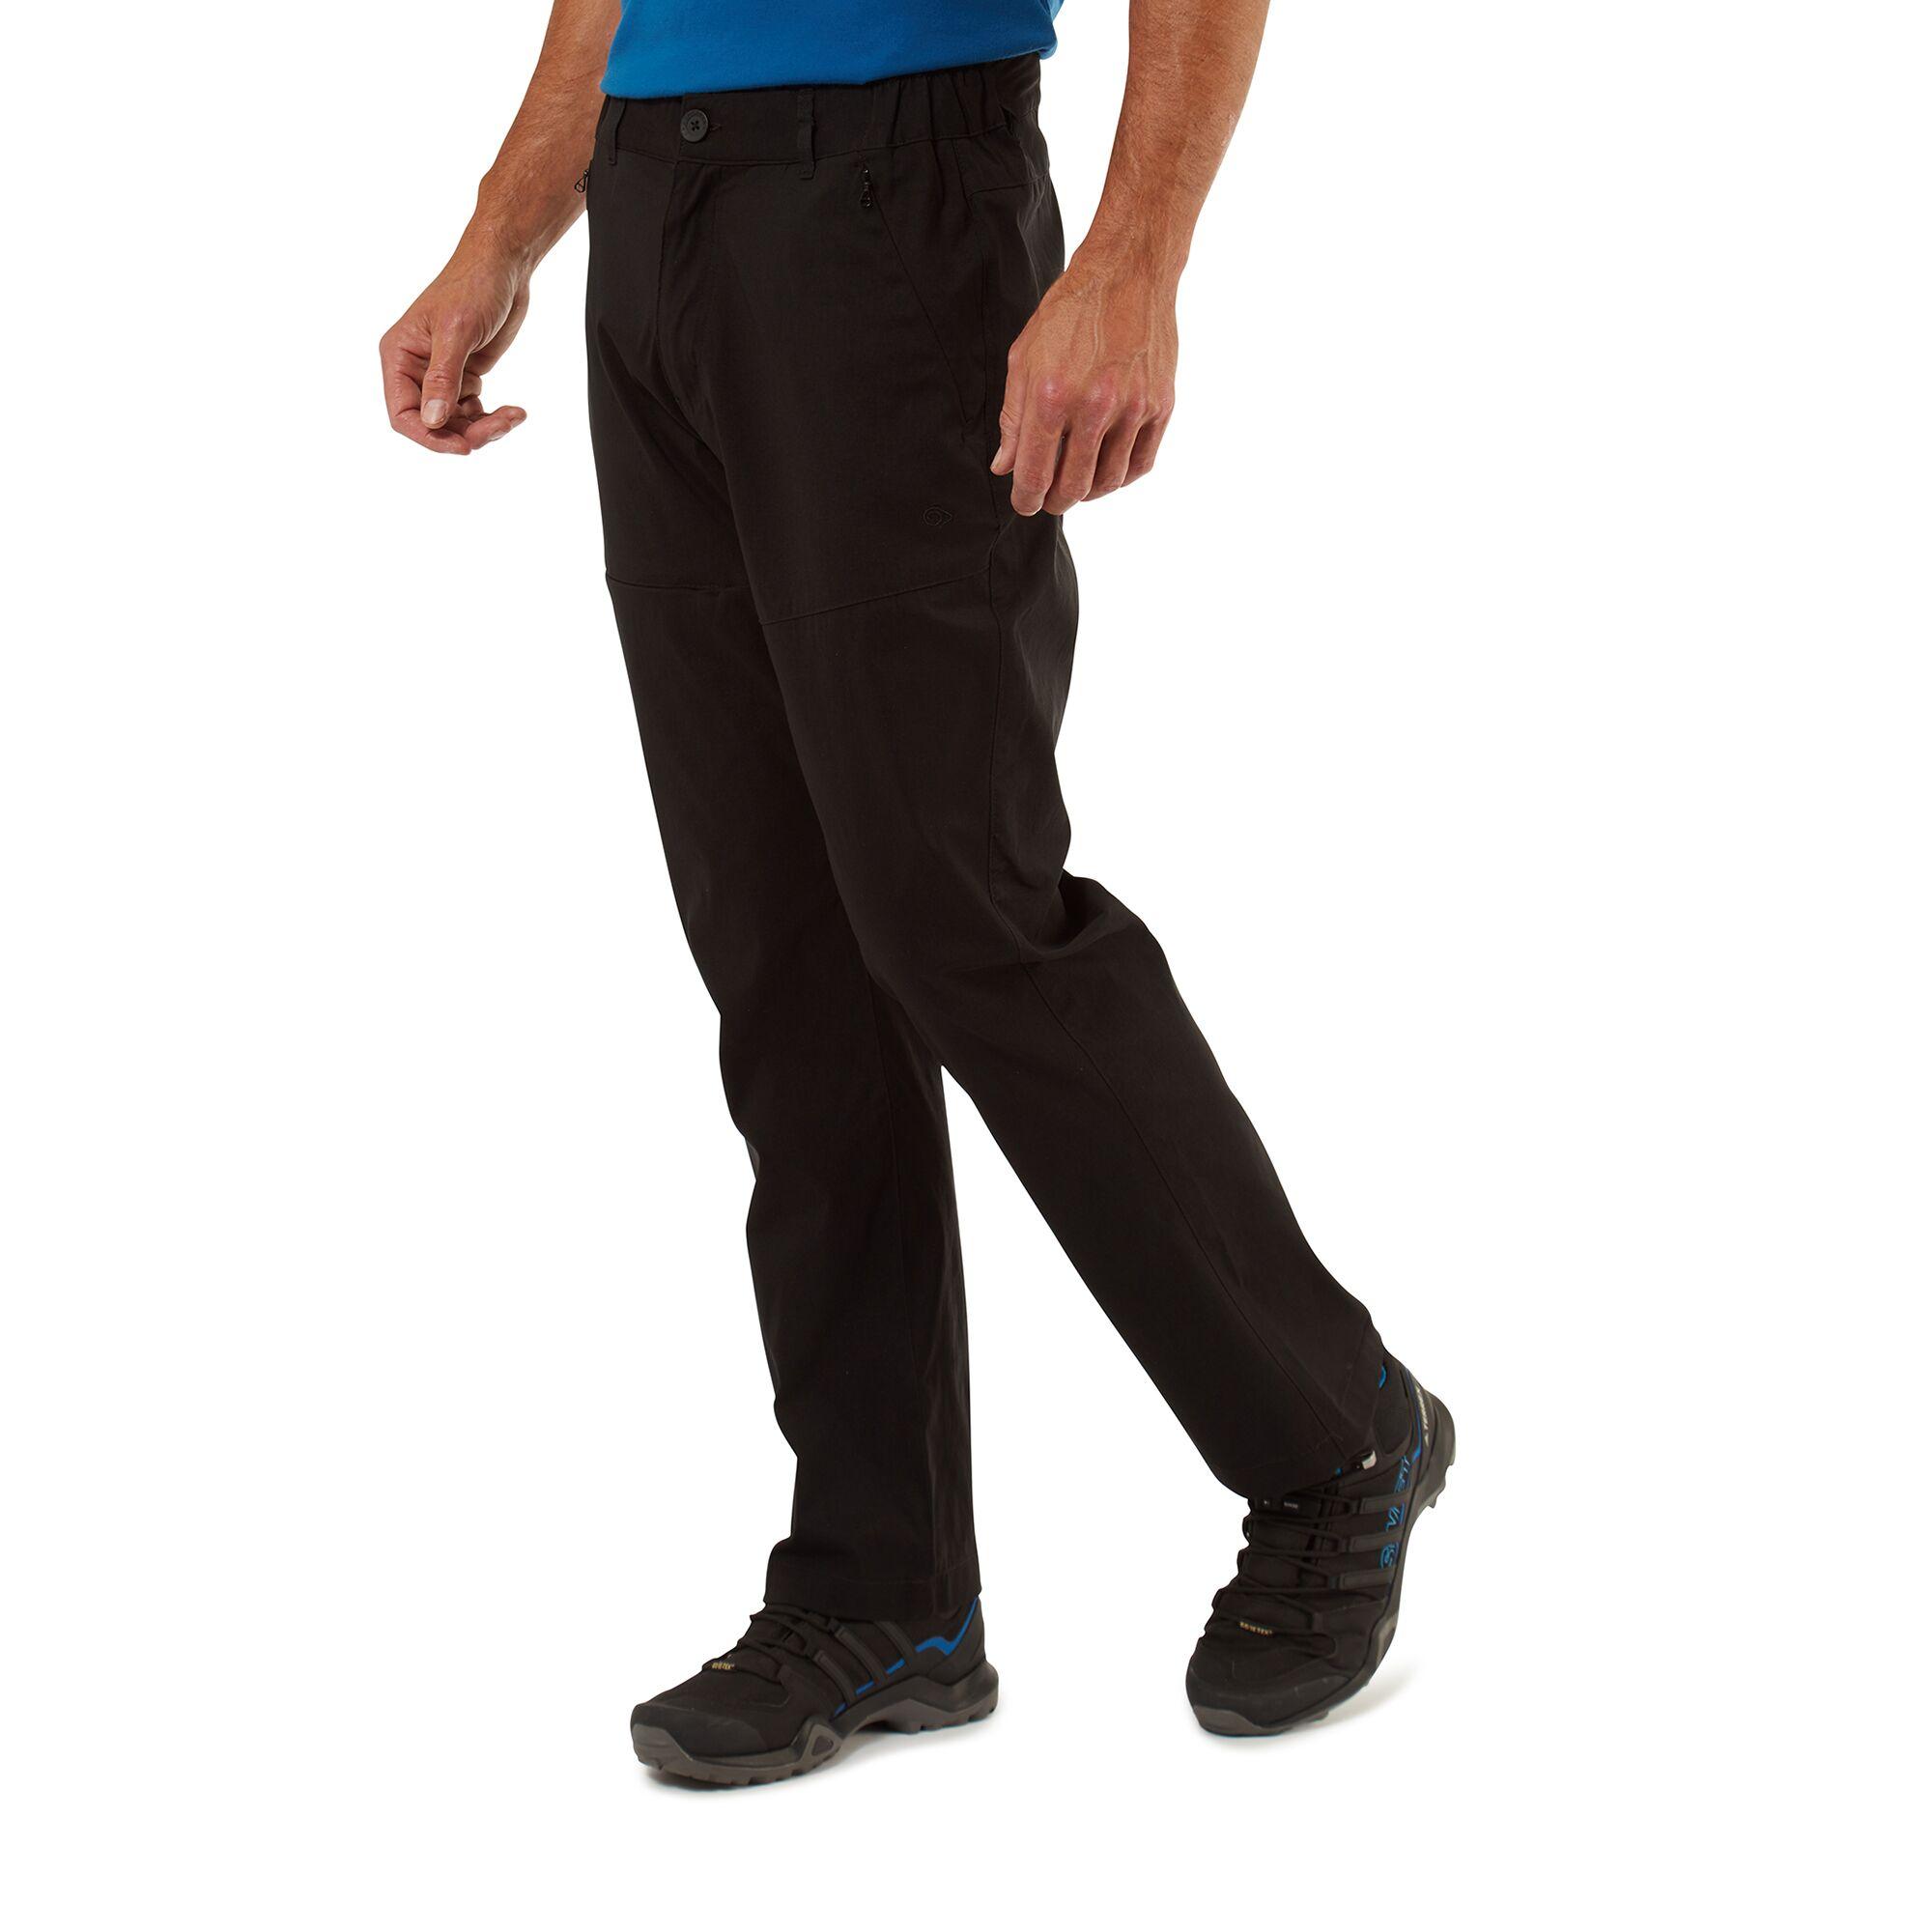 Craghoppers Mens Classic Kiwi Trousers - Bark - 40s